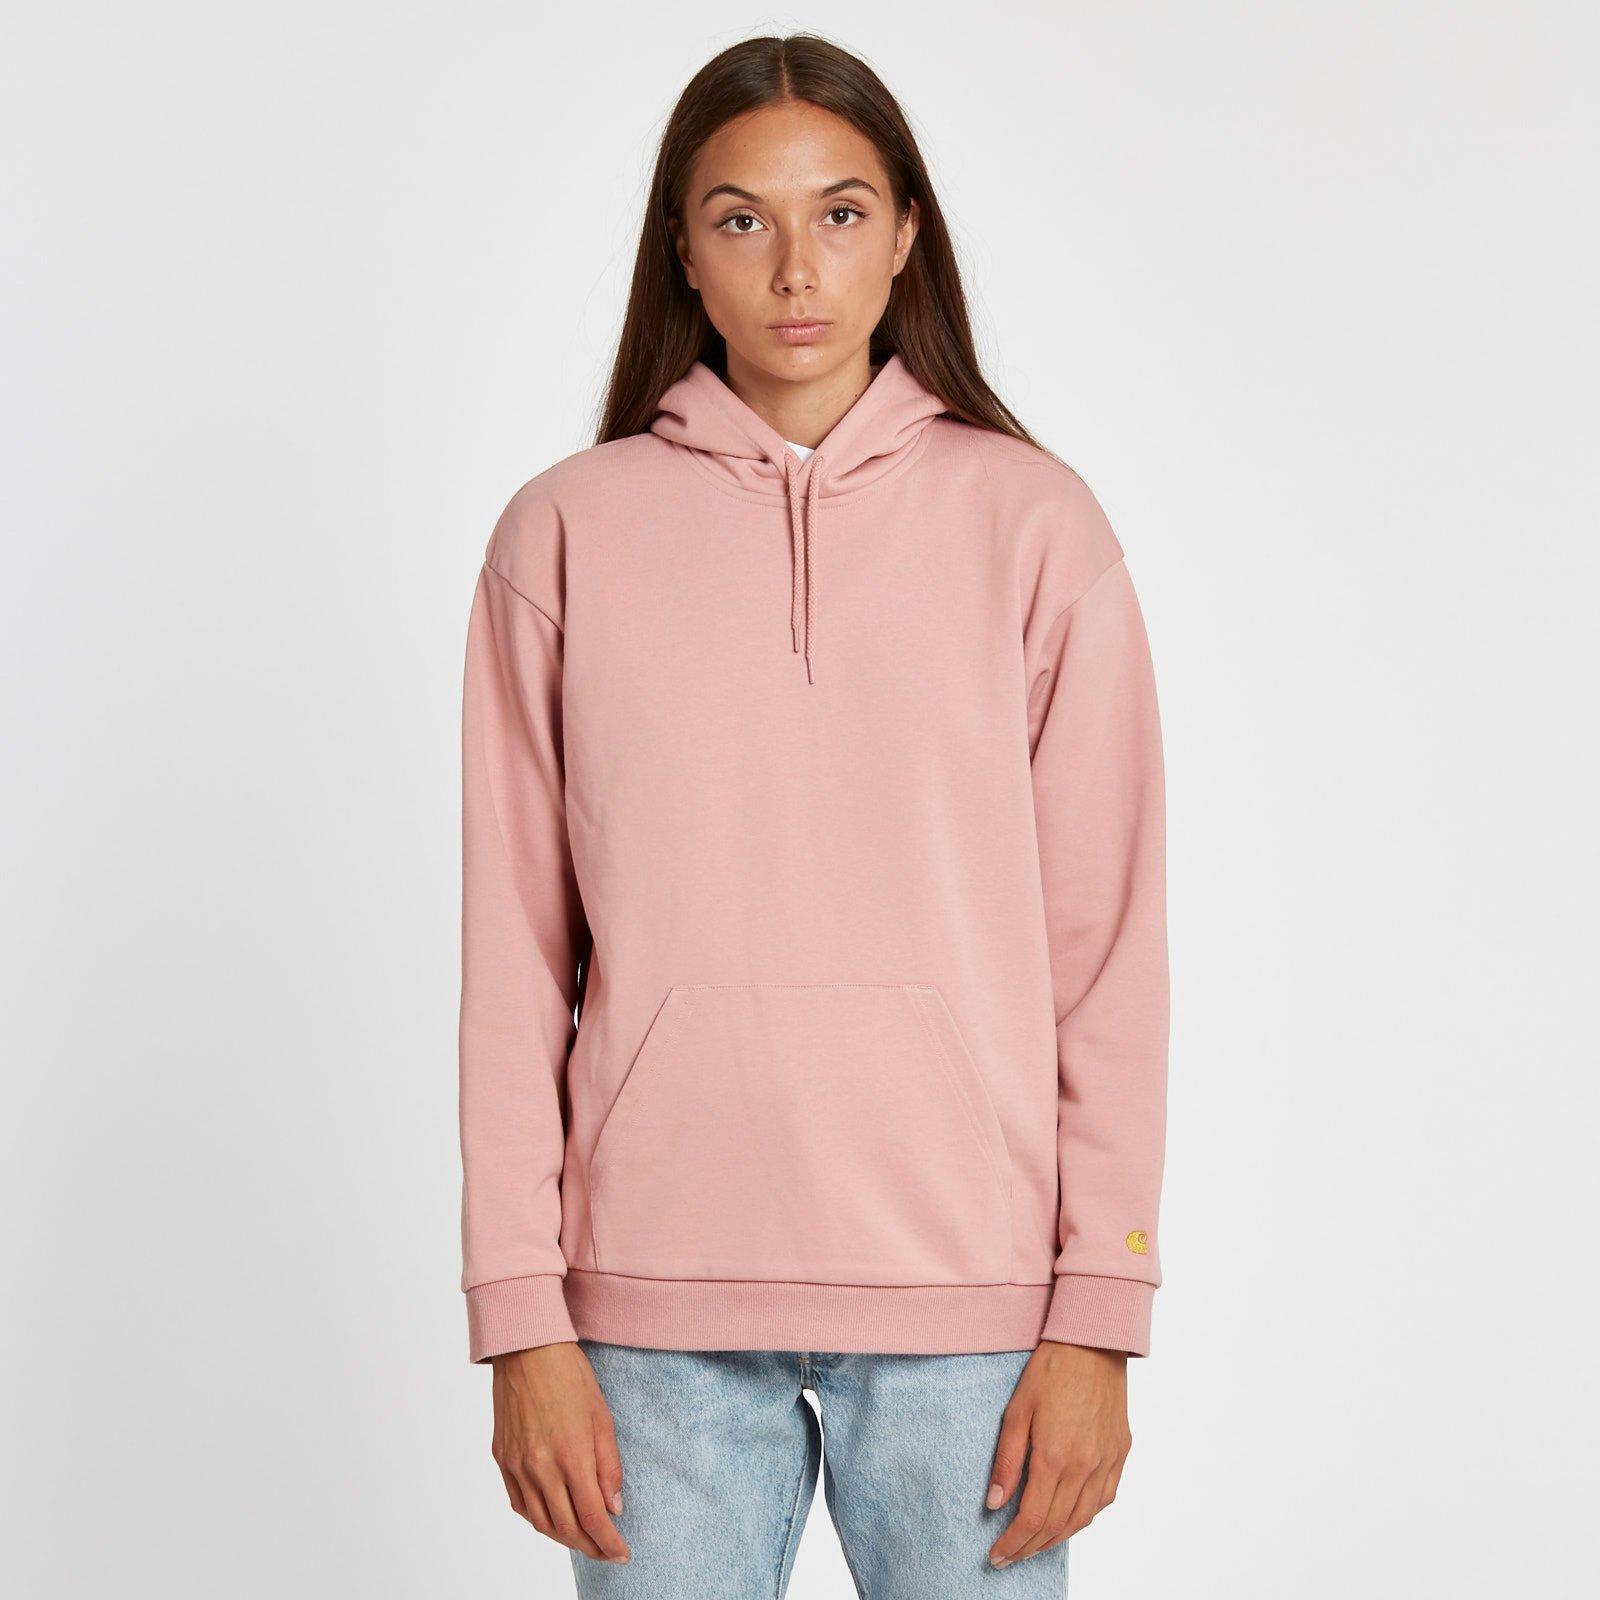 Chase Women's Crewneck Sweatshirt in 2019 | Style & Accs